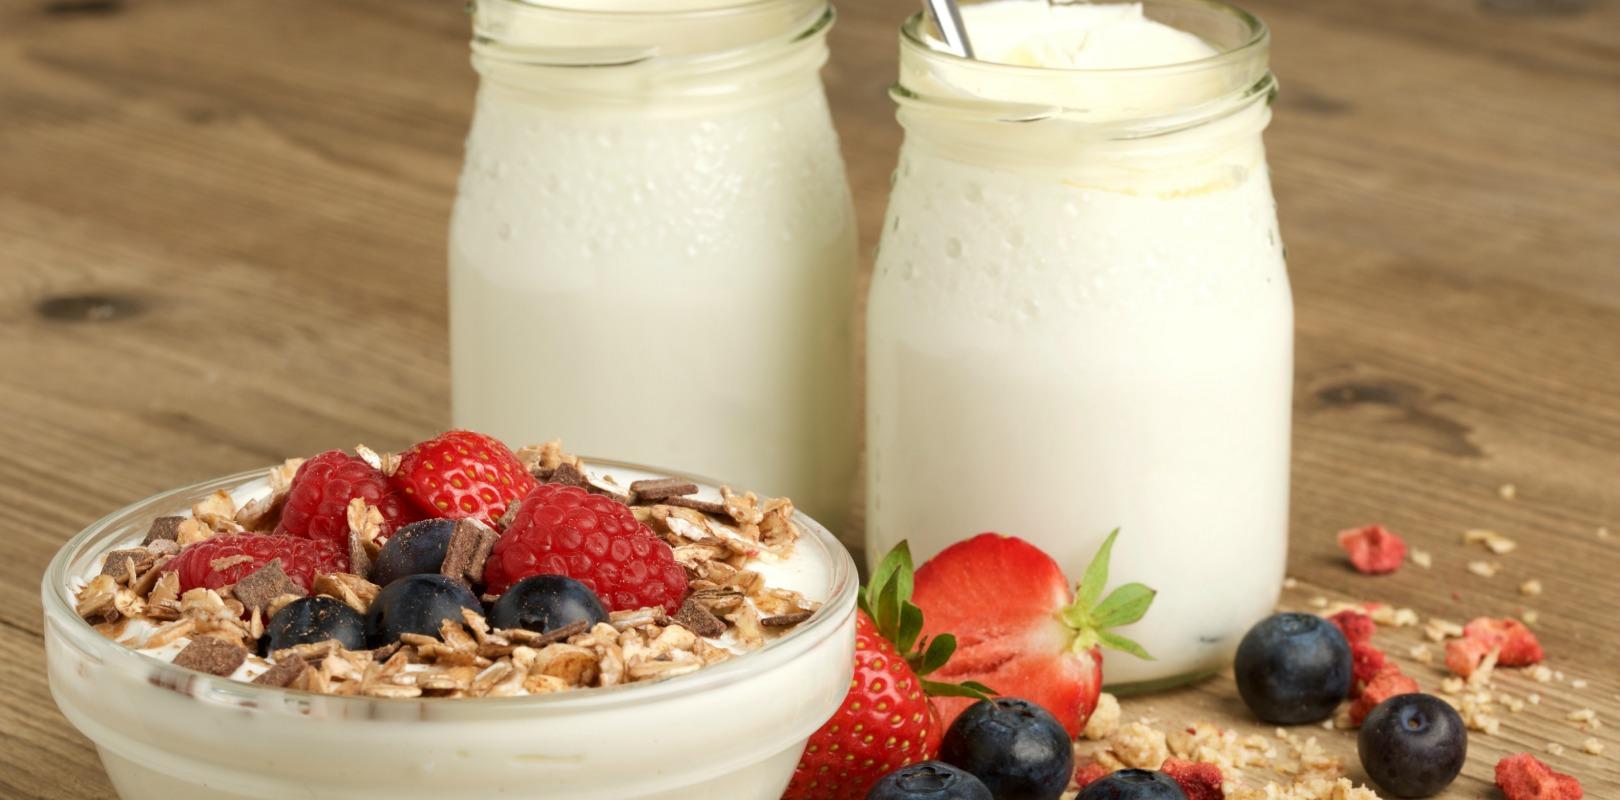 yogurt good for immune system